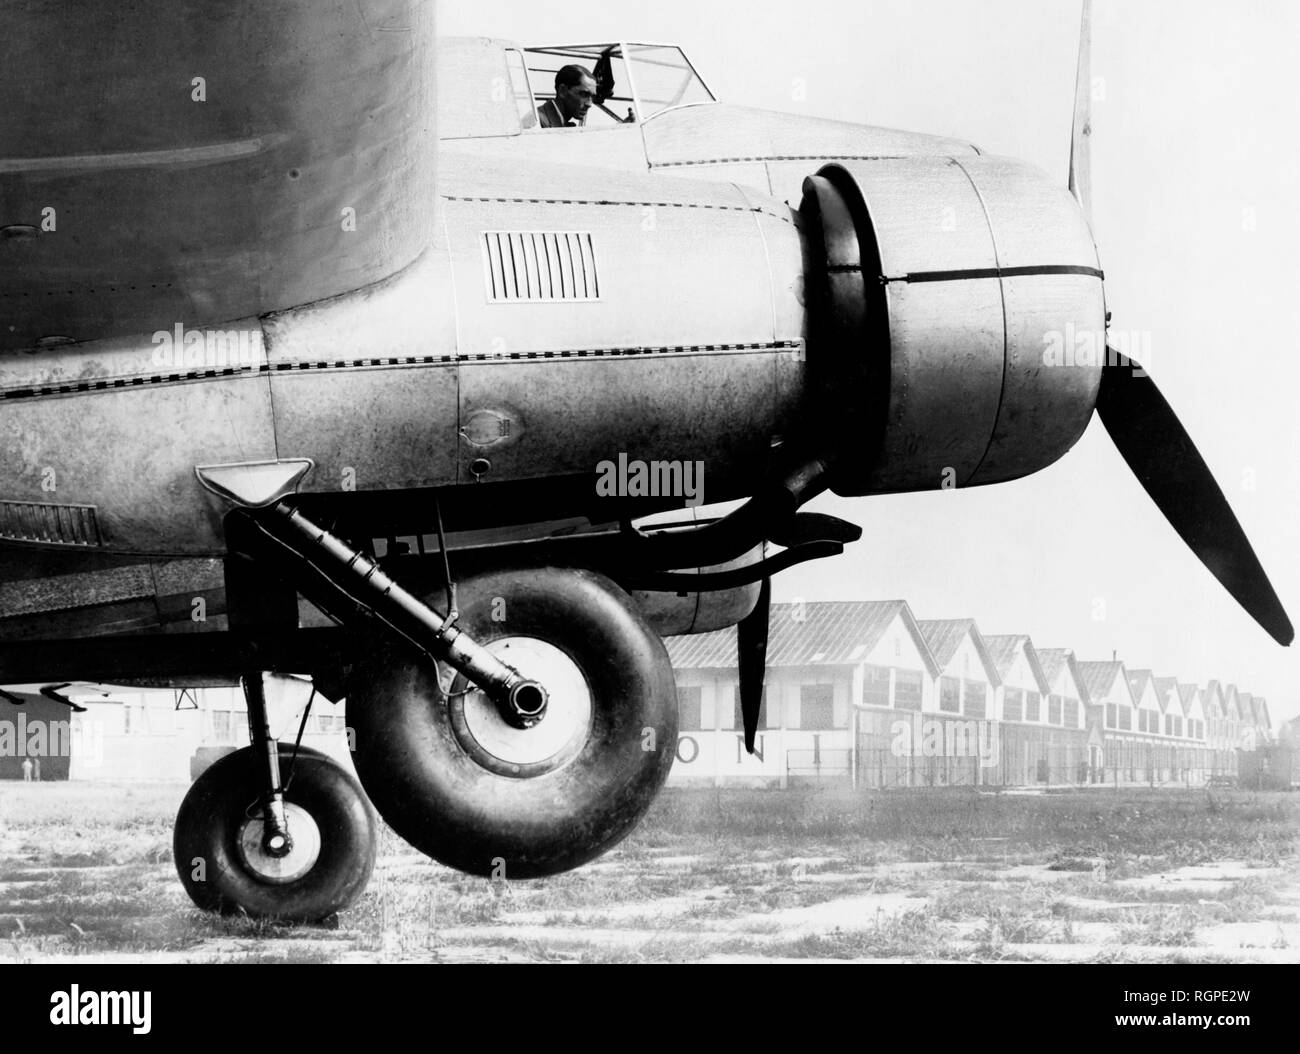 twin-engine caproni ca. 123, 1930-40 - Stock Image